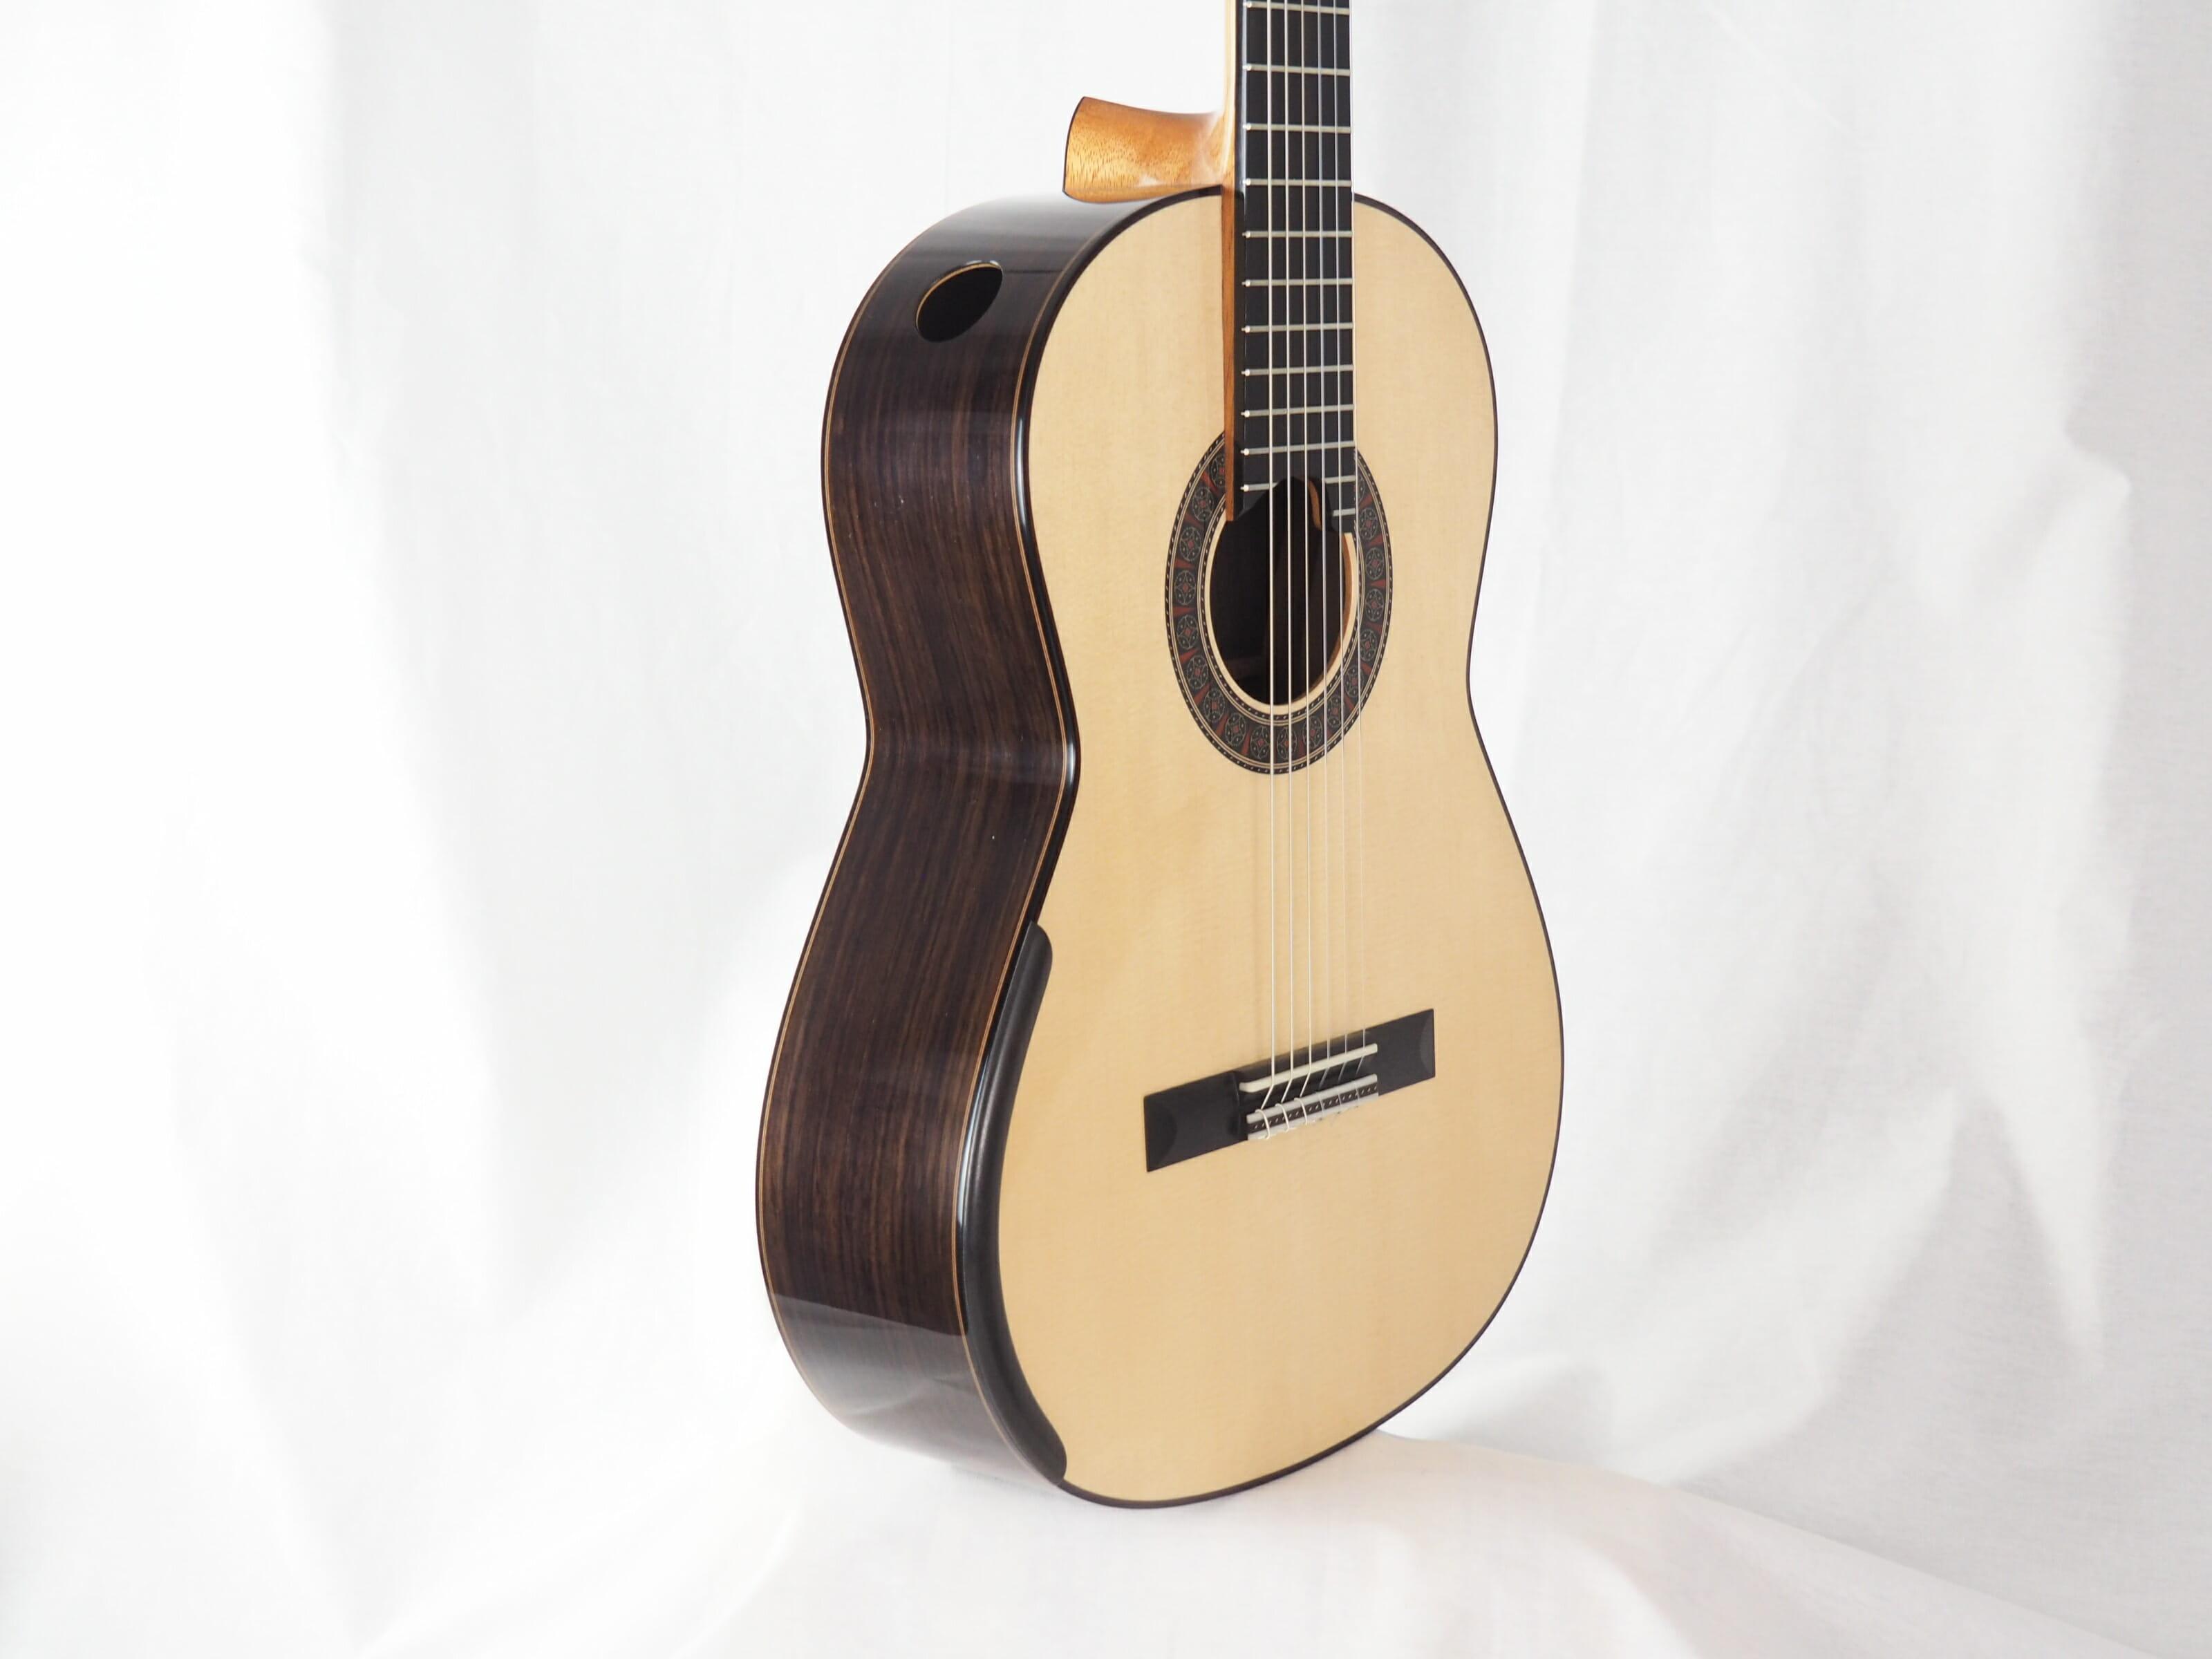 Martin Blackwell luthier guitare classique No 19BLA166-05